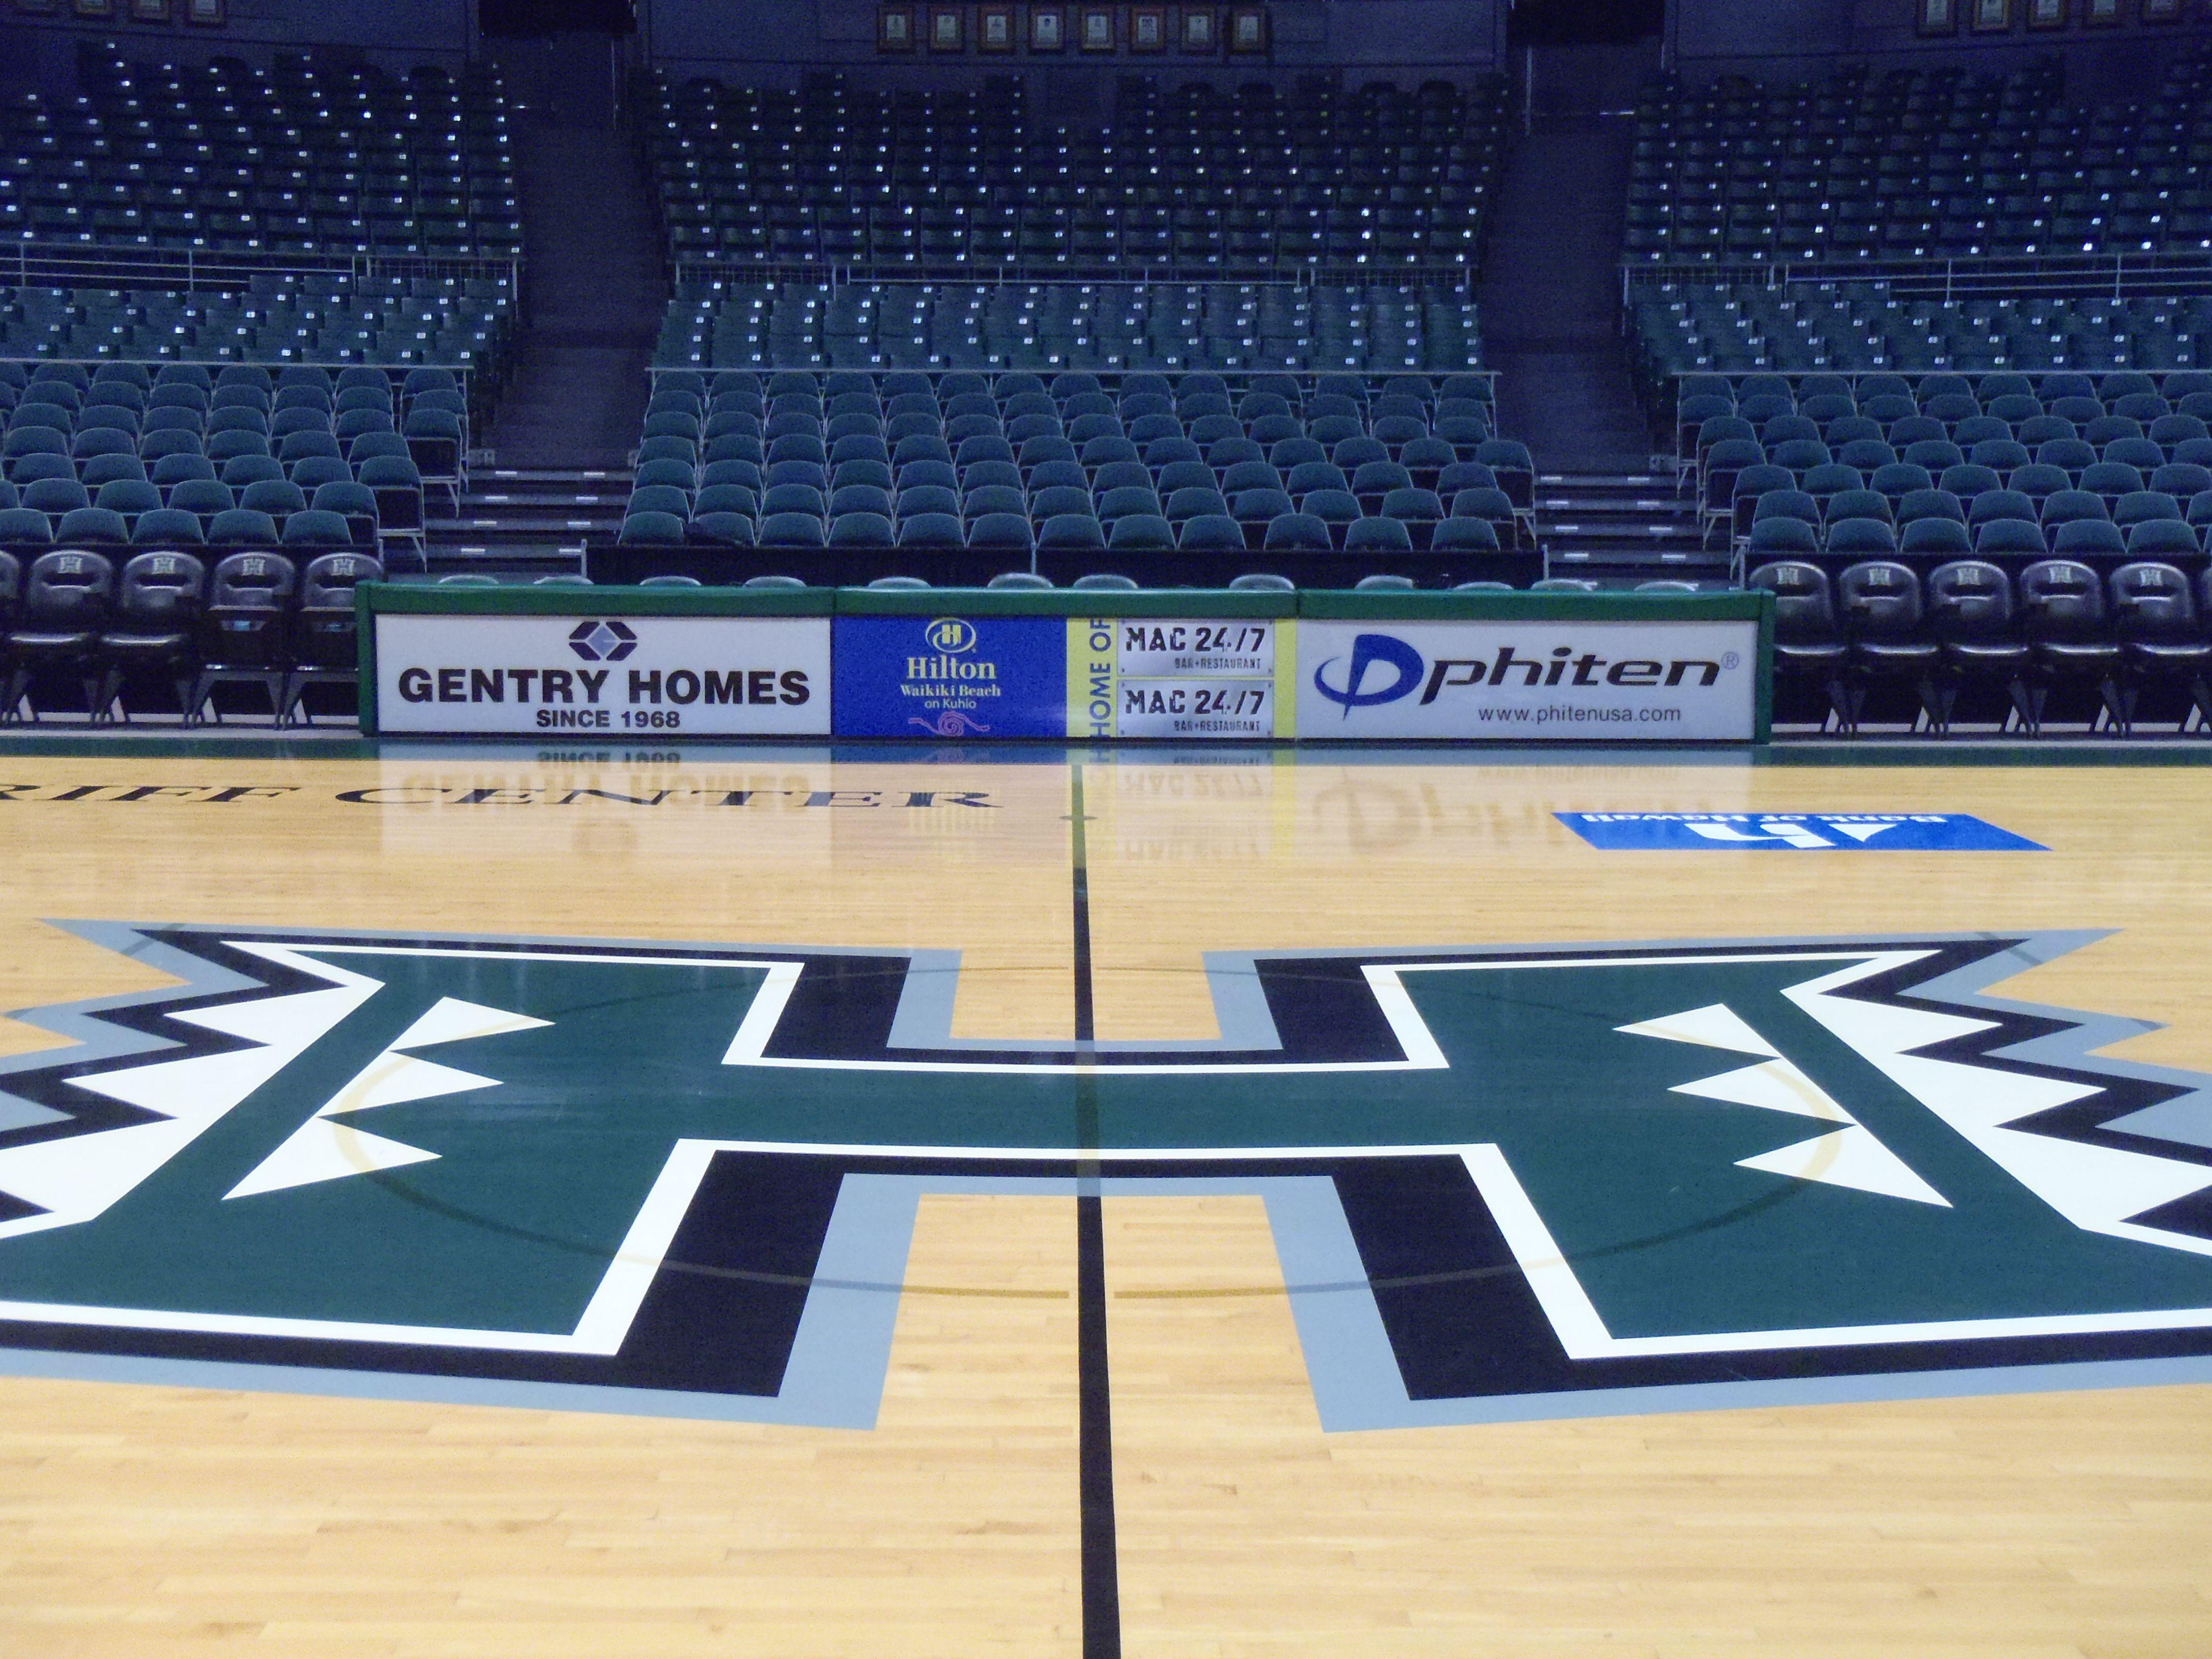 timberwolves postponed condensation by on center target floor floors threatened targetcenterfloor game basketball